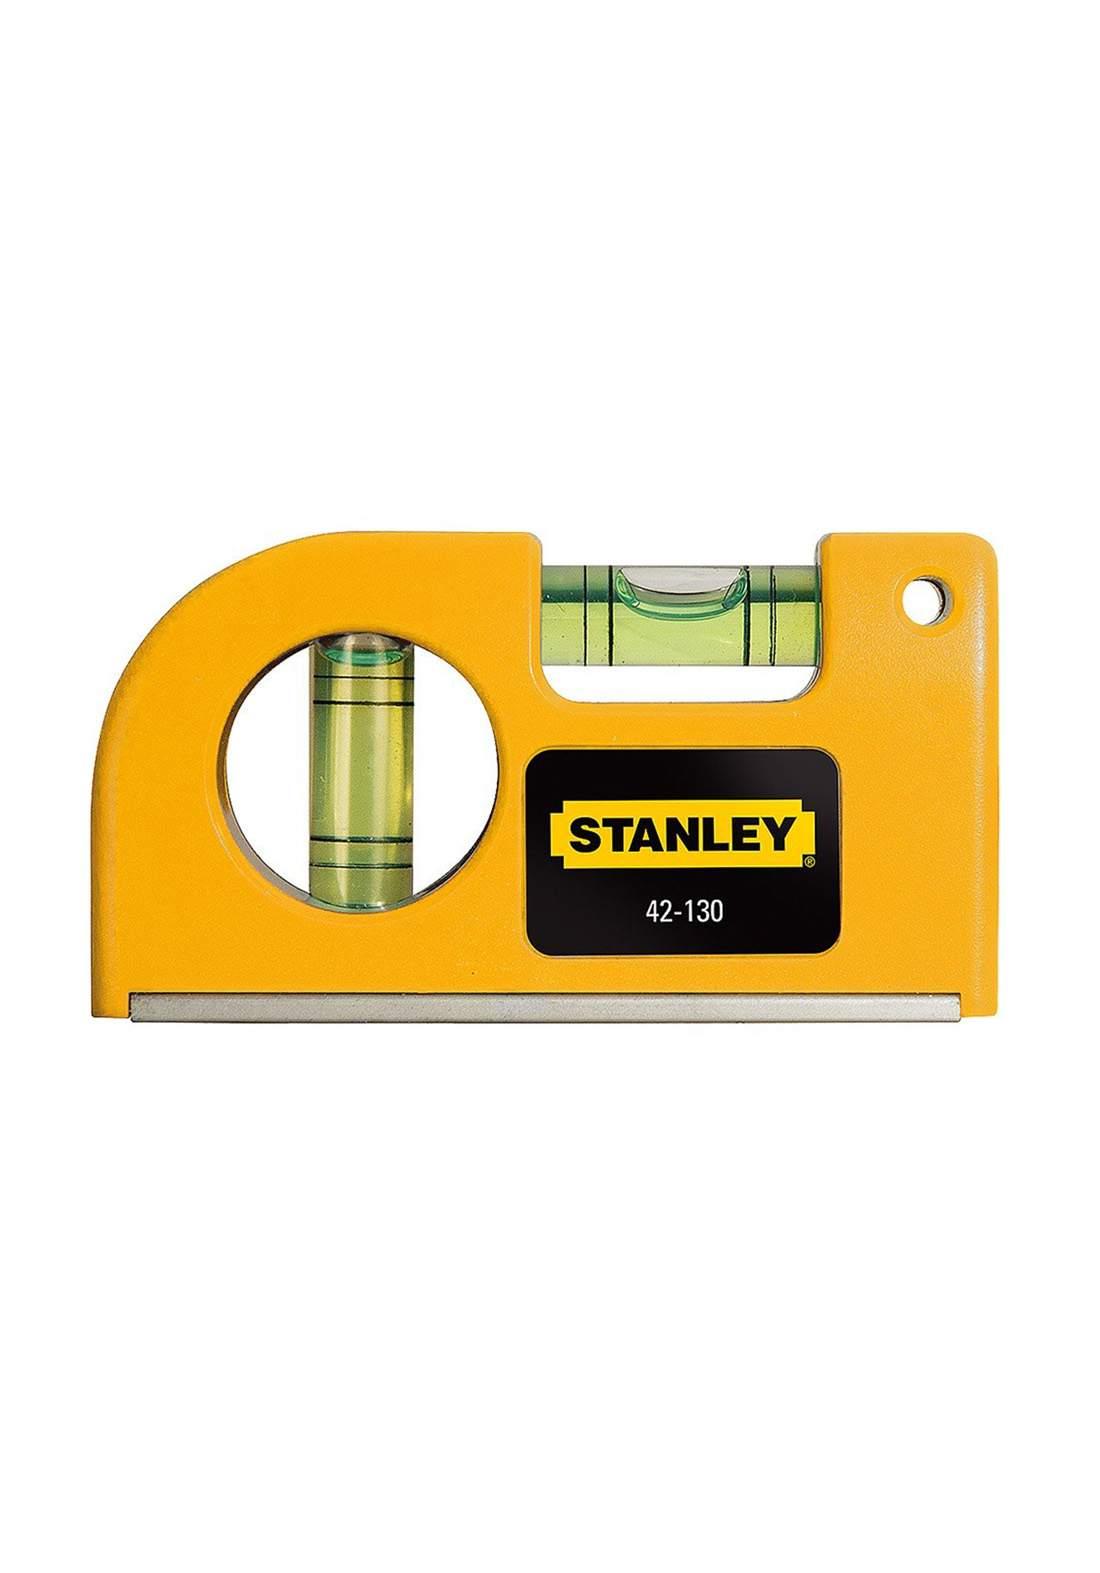 Stanley 0-42-130 Plastic Level Meter Magnetic 22.9 cm قبان